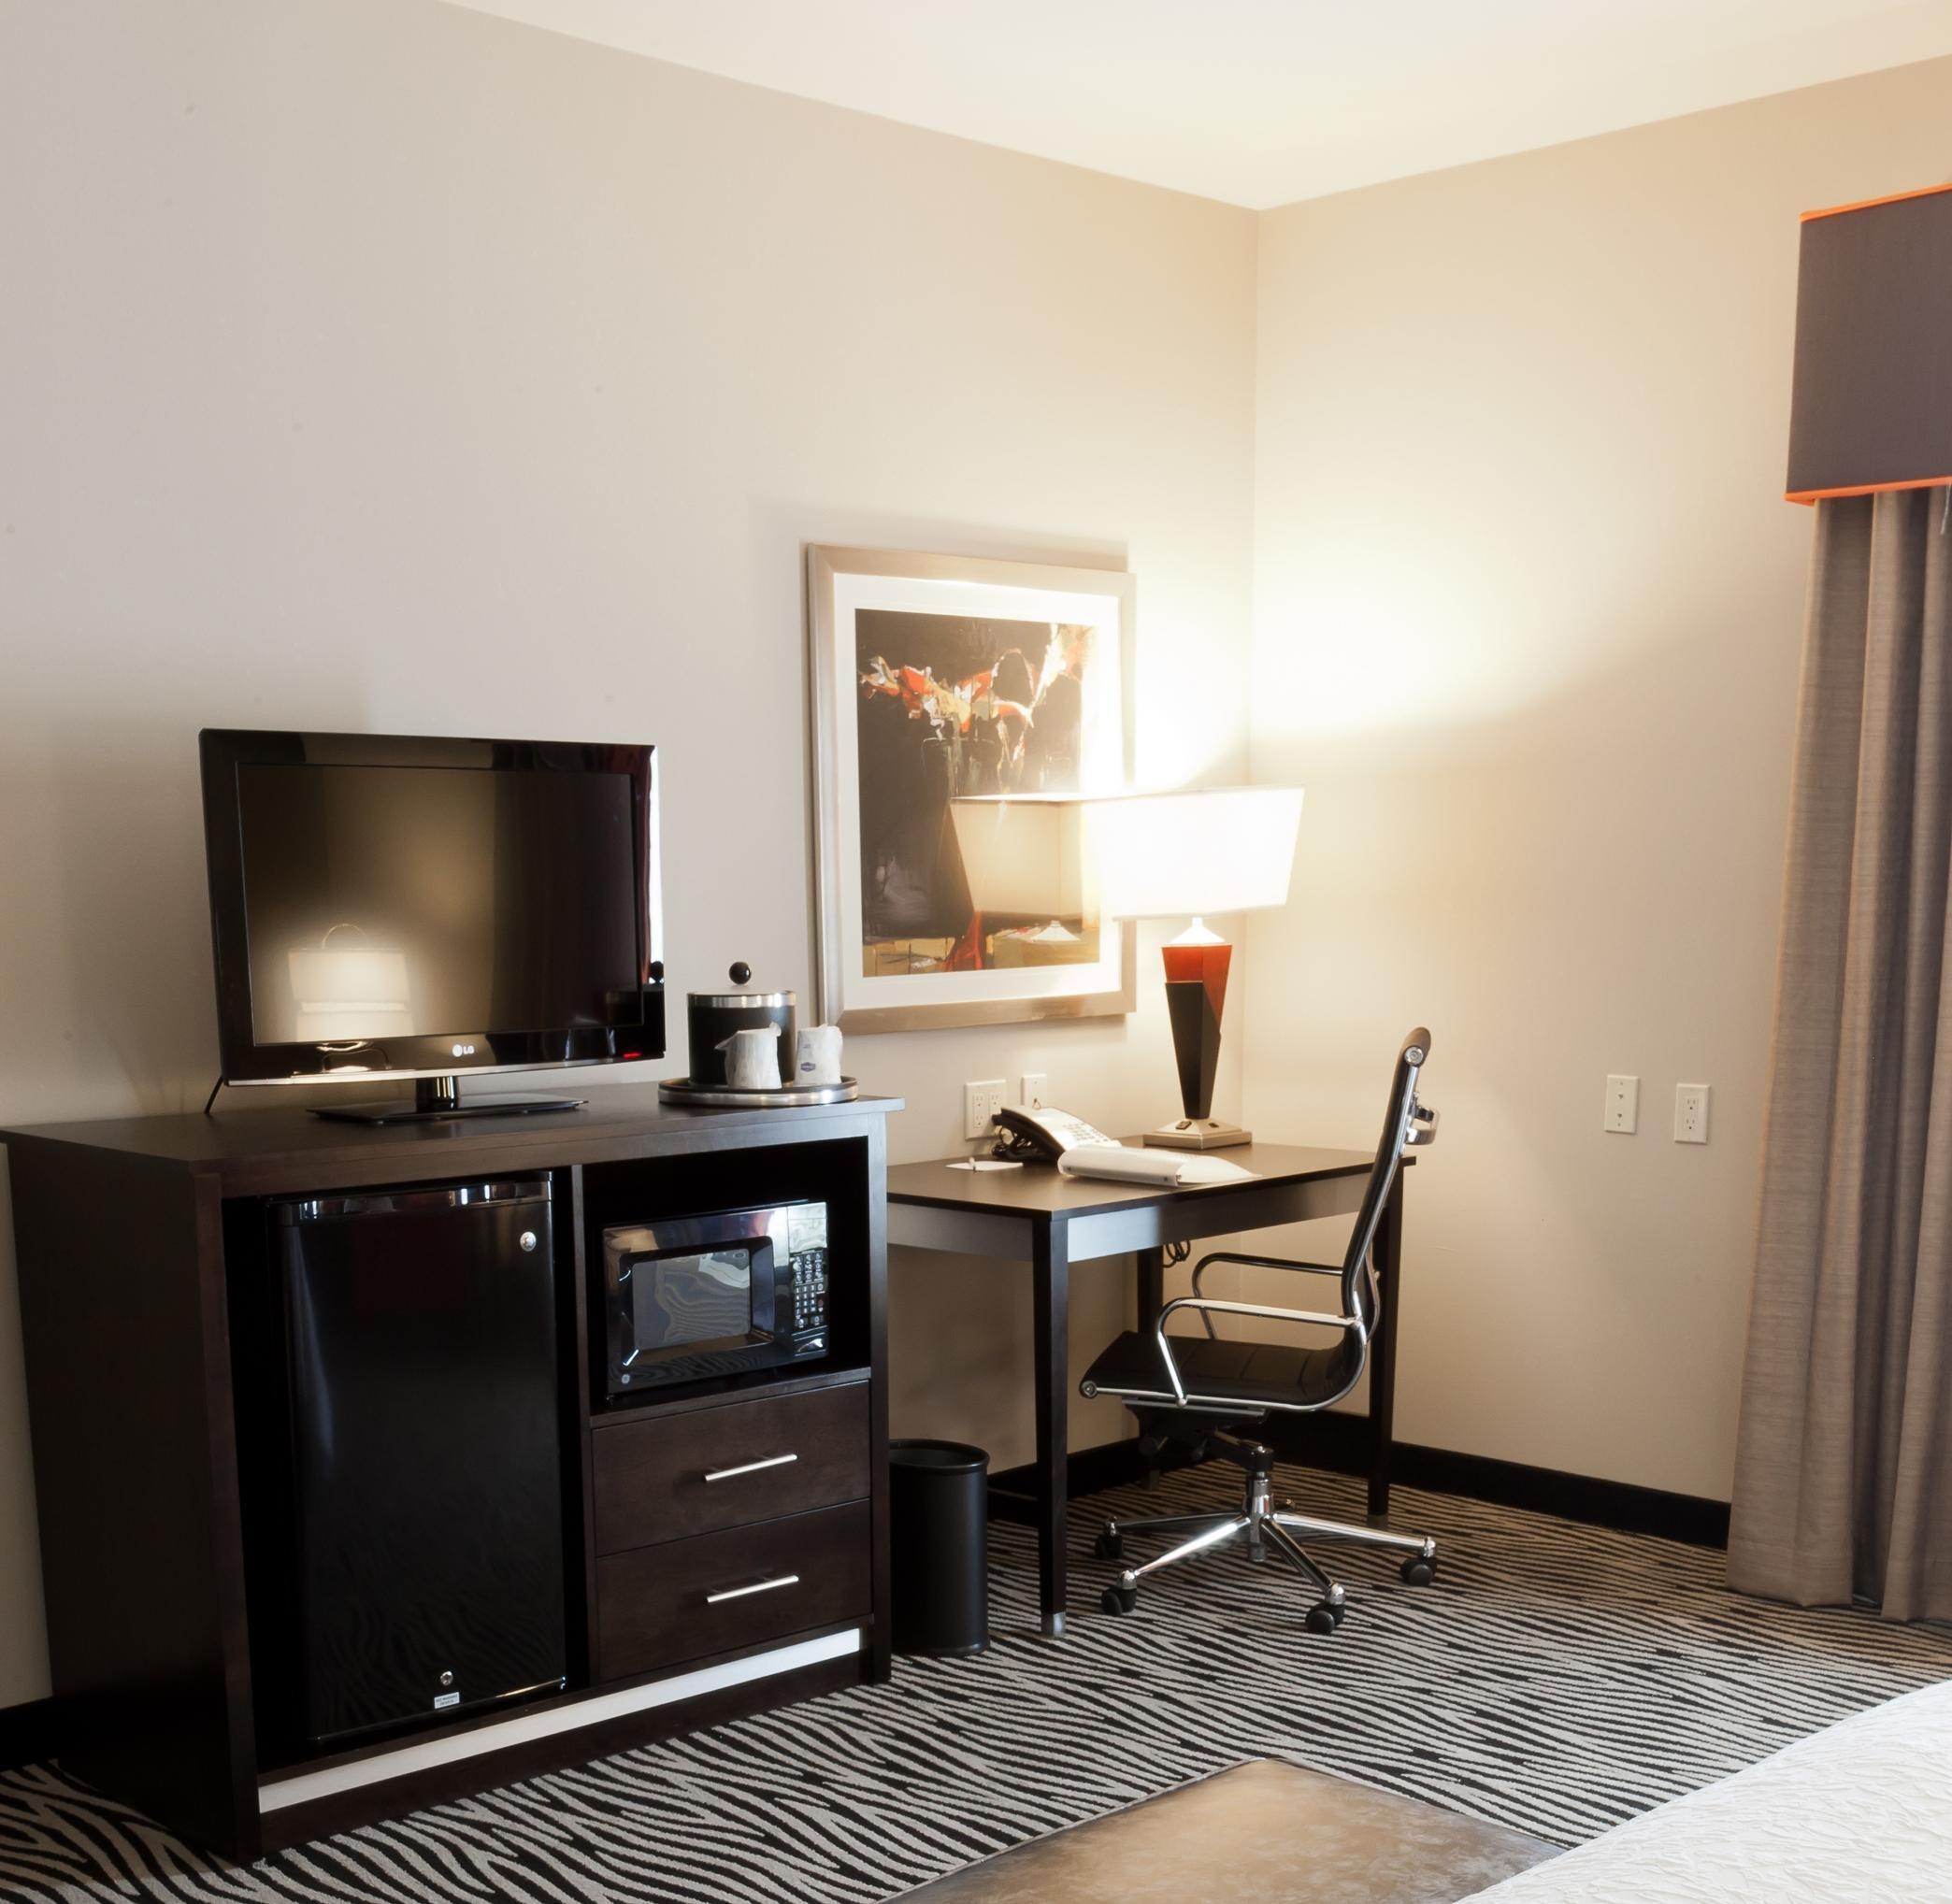 Hampton Inn & Suites Tulsa/Central image 9